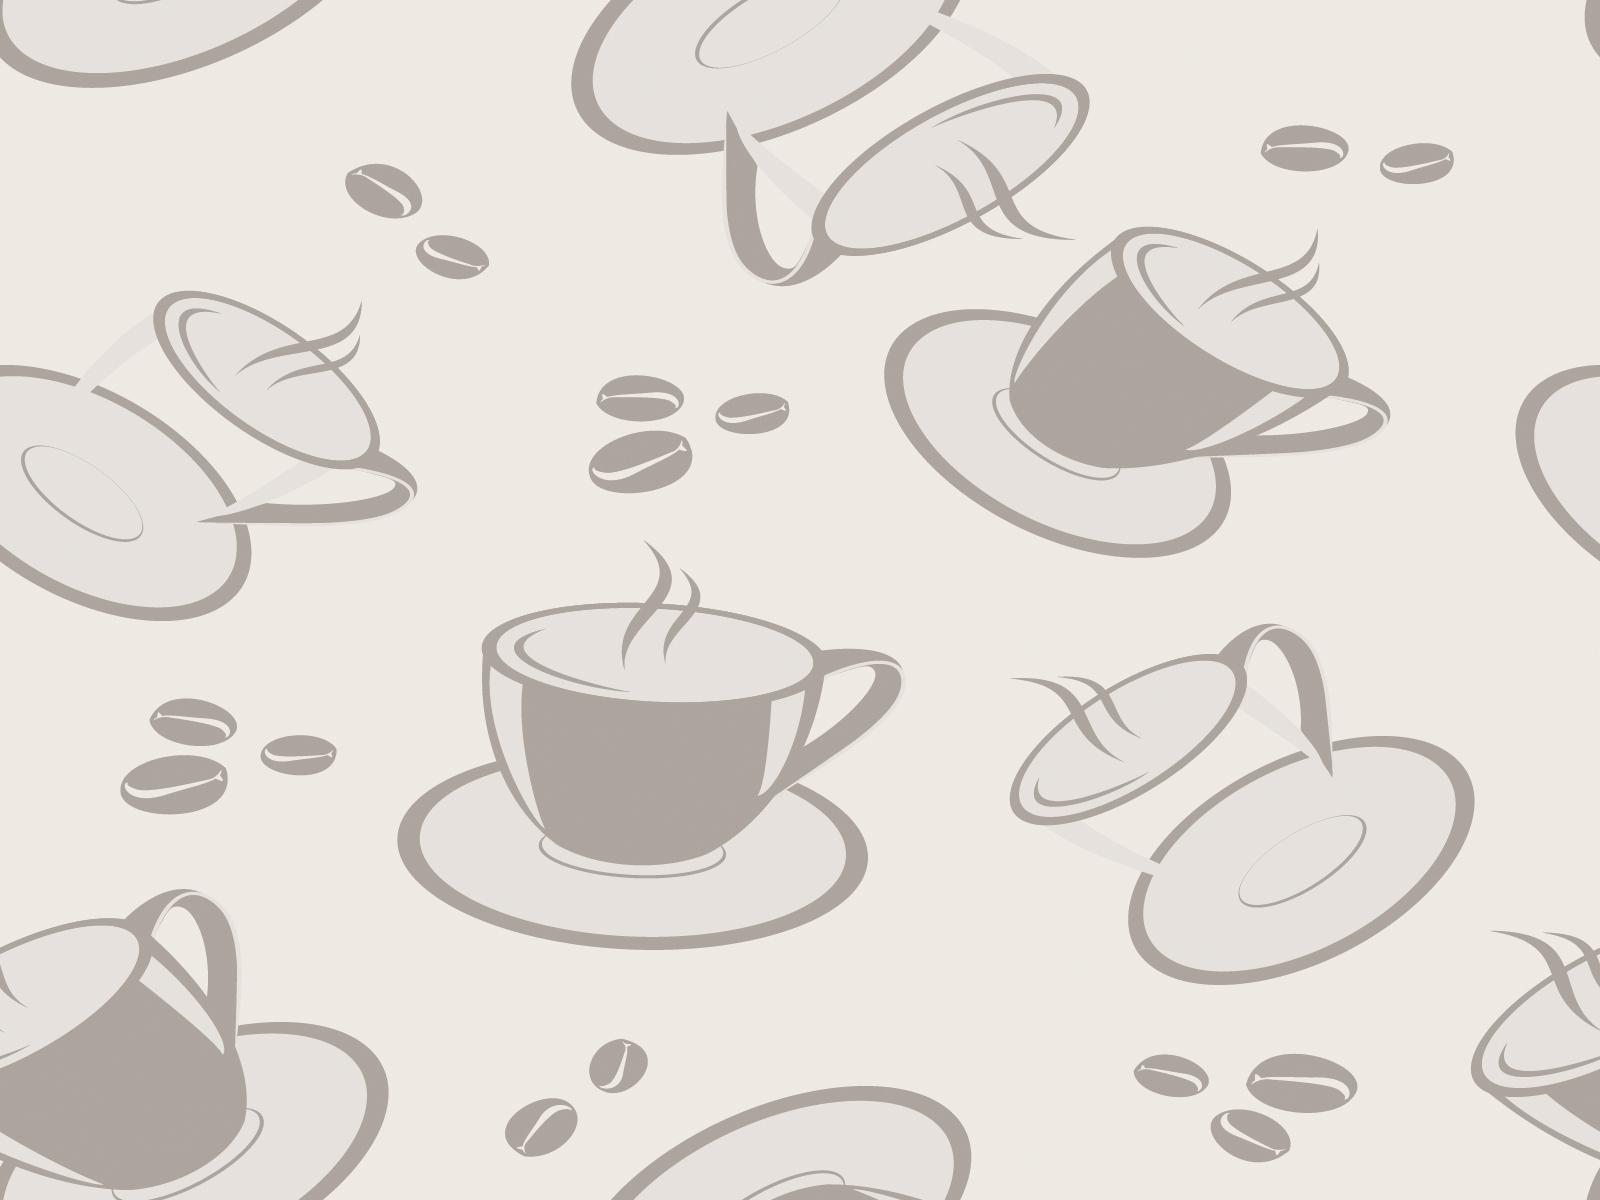 coffee team design for pattern backgrounds foods drinks pattern templates free ppt. Black Bedroom Furniture Sets. Home Design Ideas